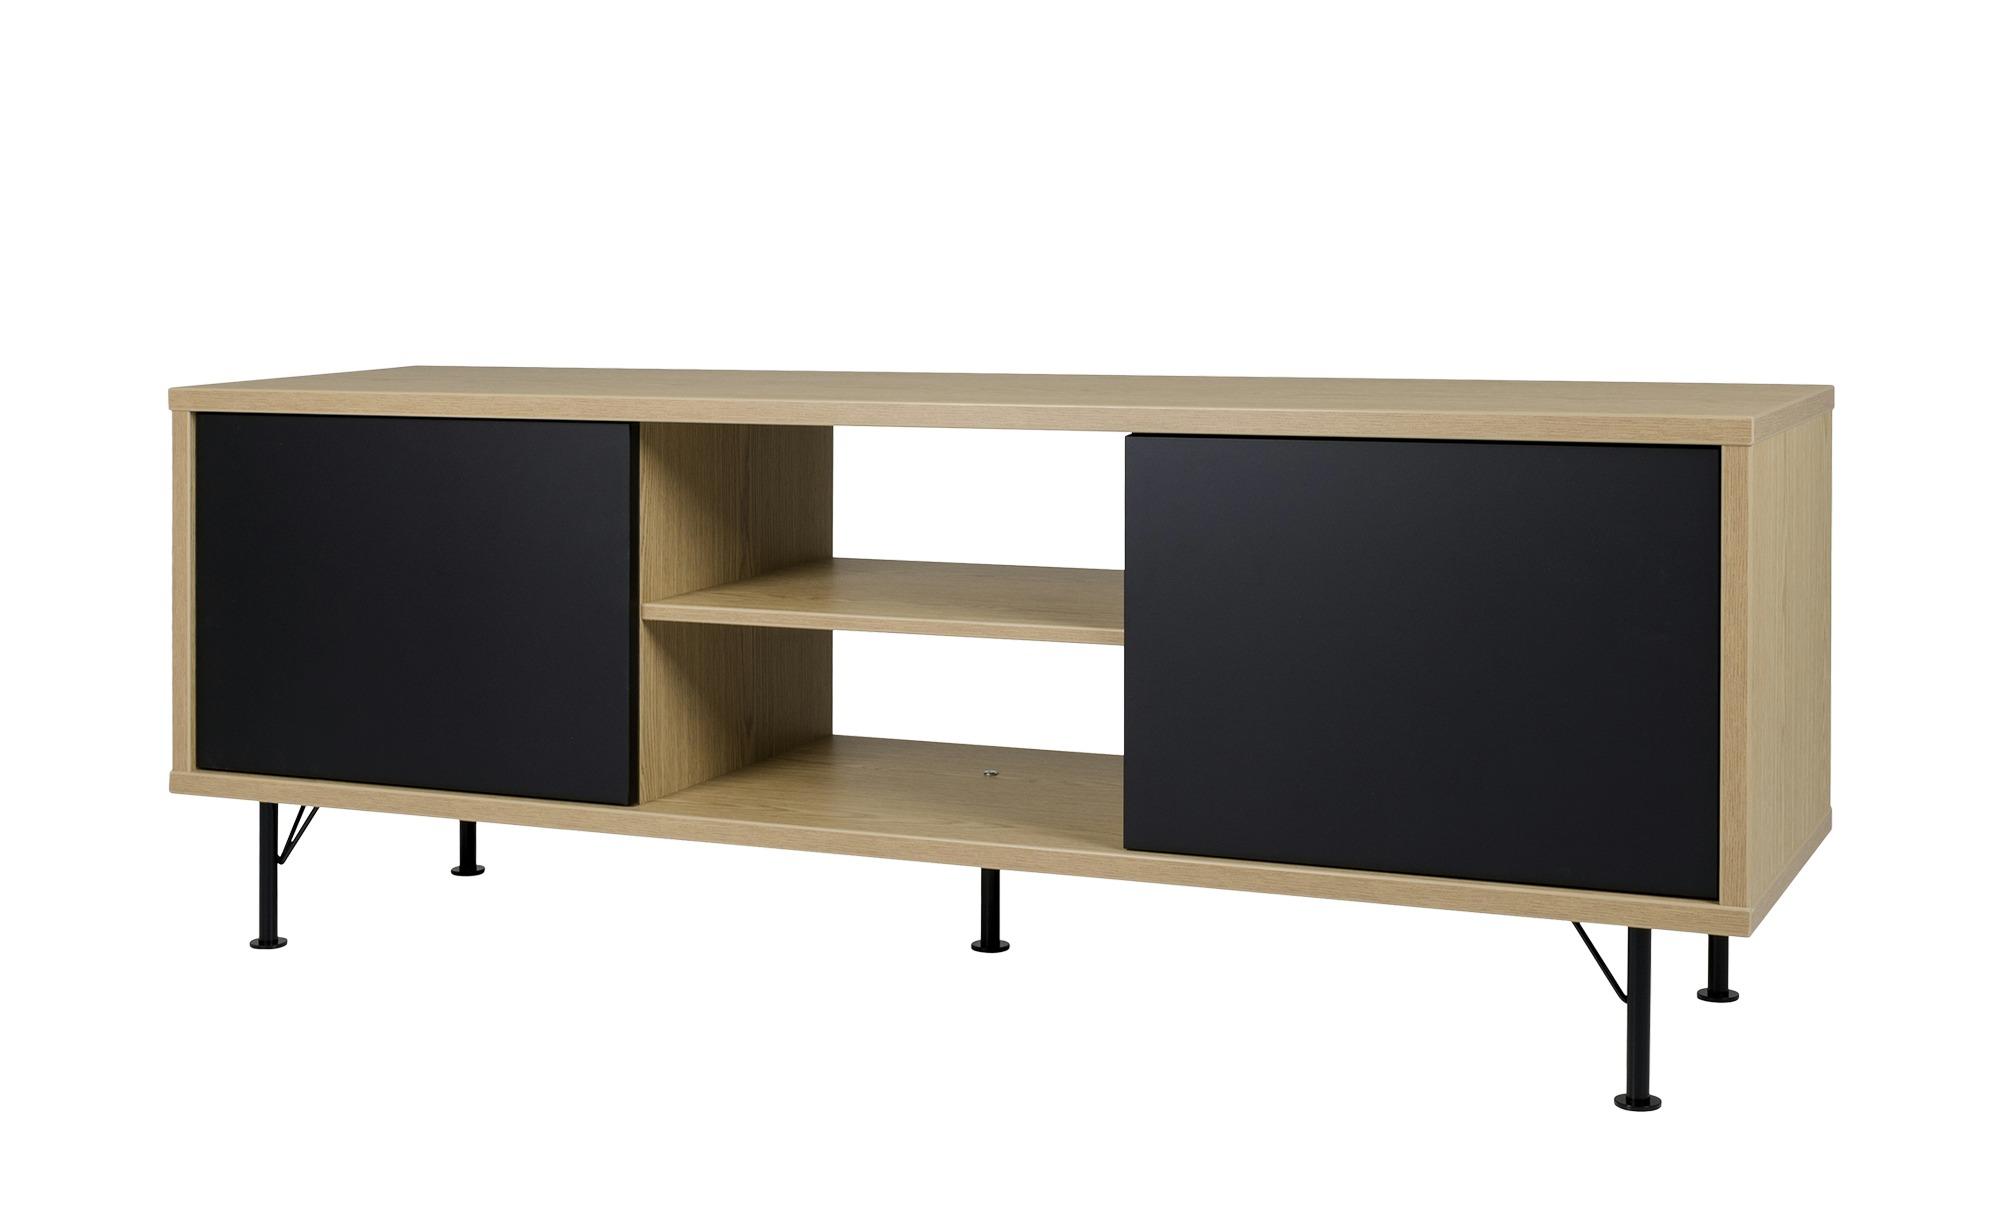 TV-Lowboard   Malte ¦ schwarz ¦ Maße (cm): B: 164 H: 60 T: 44 TV- & Media Möbel > TV-Schränke - Höffner